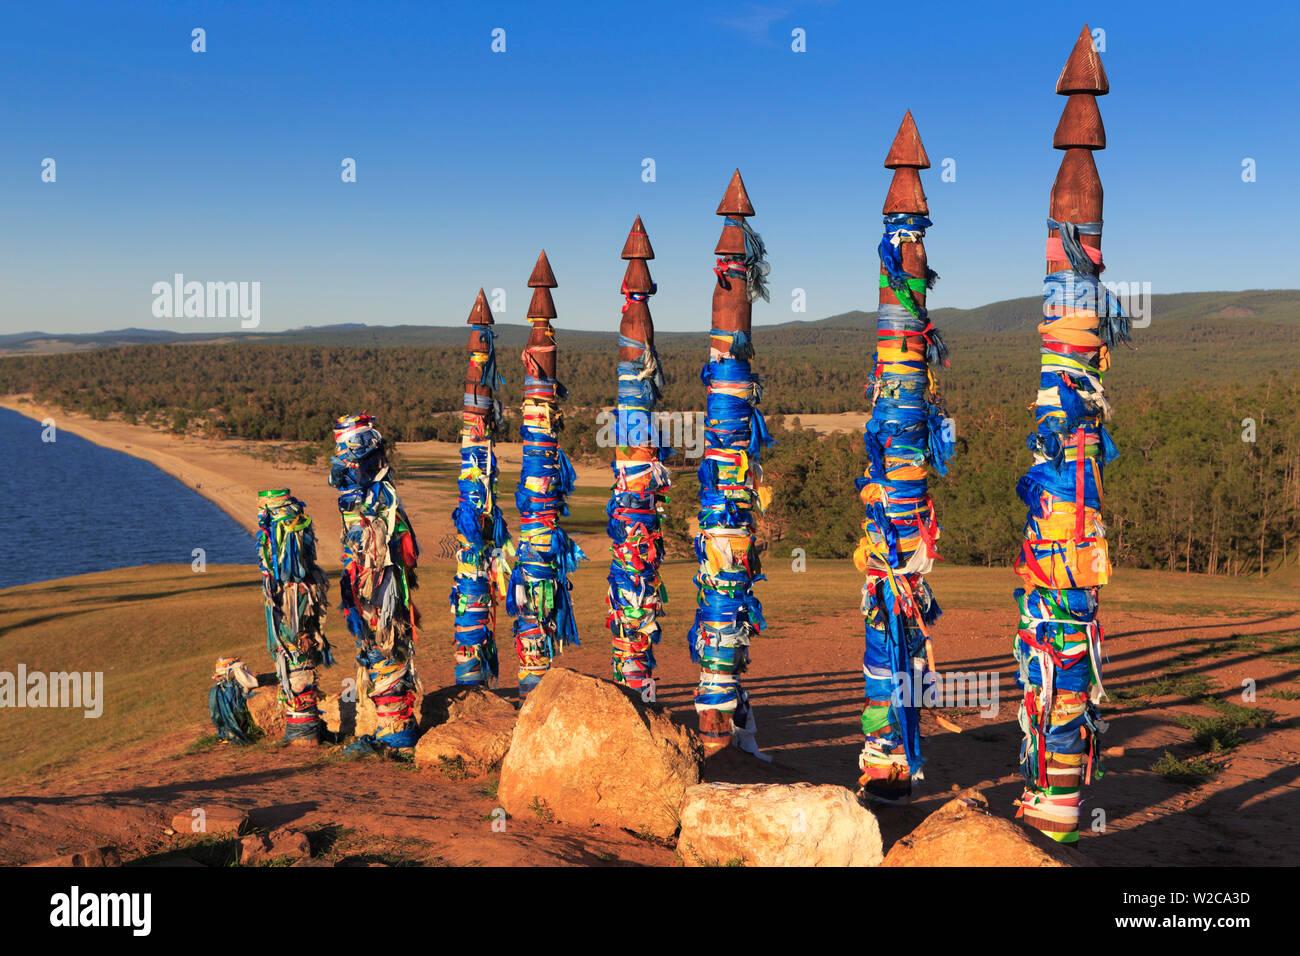 Totem poles, Olkhon island, landscape near Khuzhir, Baikal lake, Russia - Stock Image